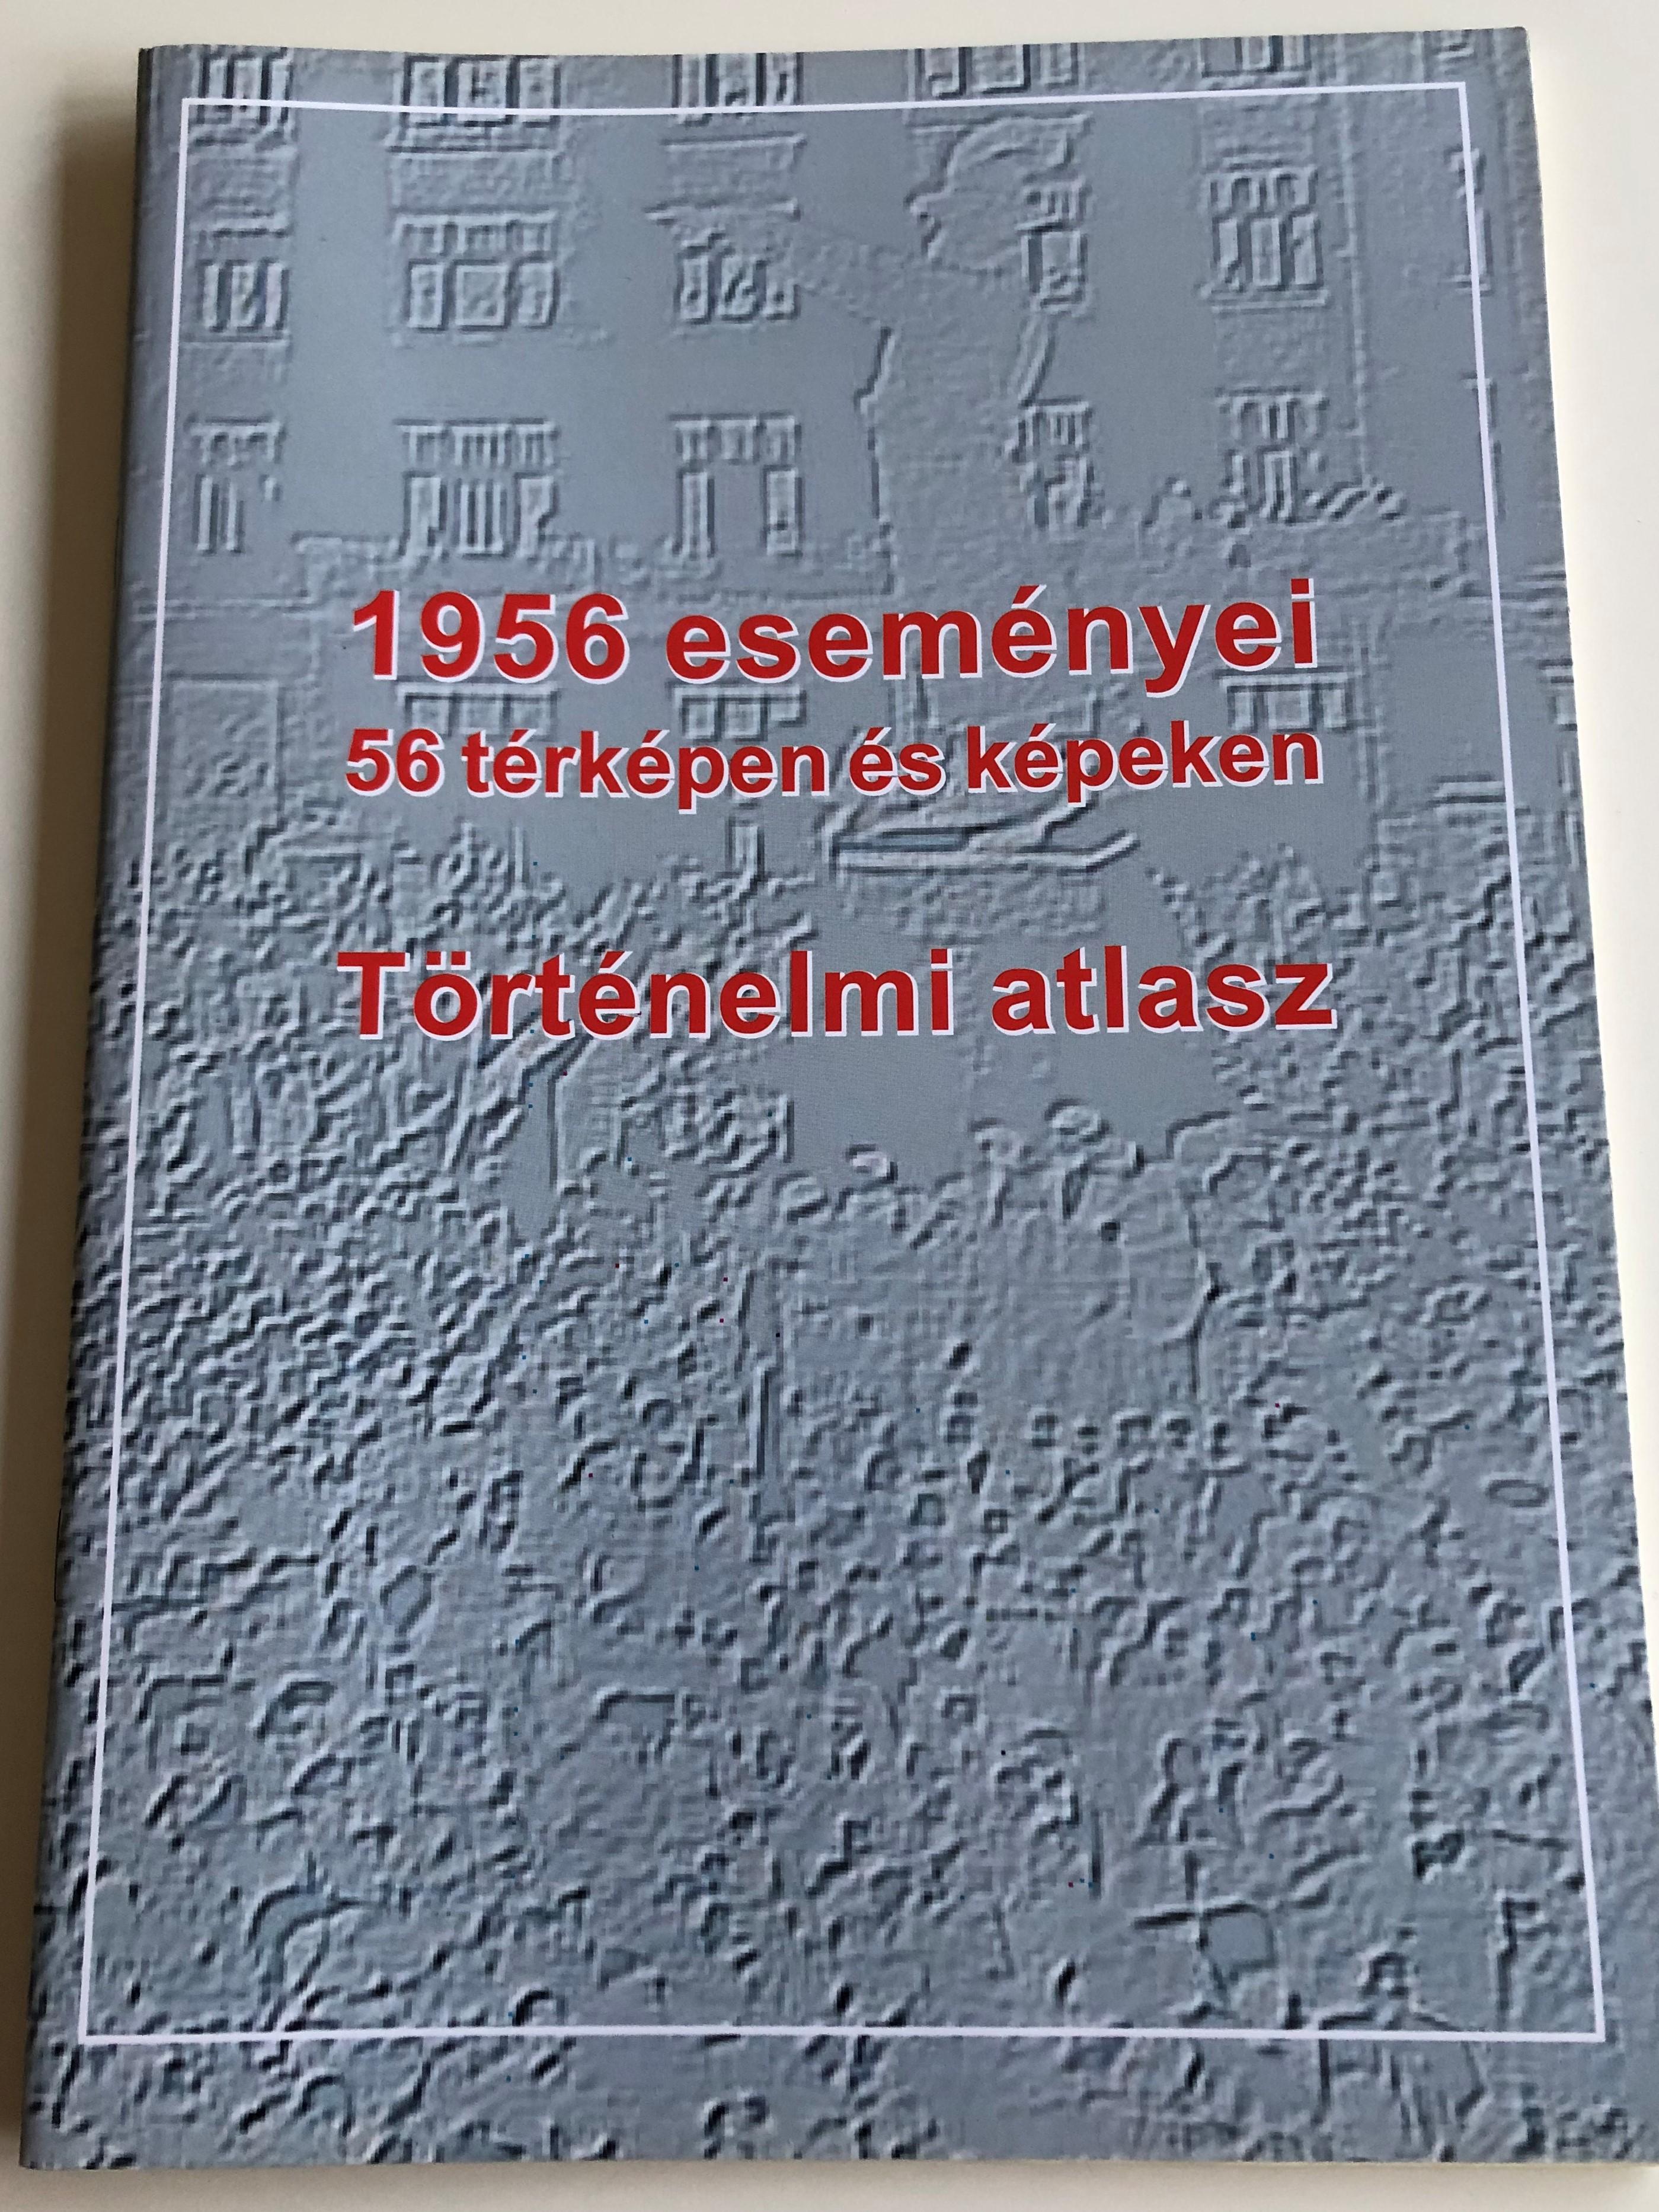 1956-esem-nyei-56-t-rk-peken-s-k-peken-t-rt-nelmi-atlas-the-events-of-1956-on-maps-and-photos-historical-atlas-2006-1-.jpg